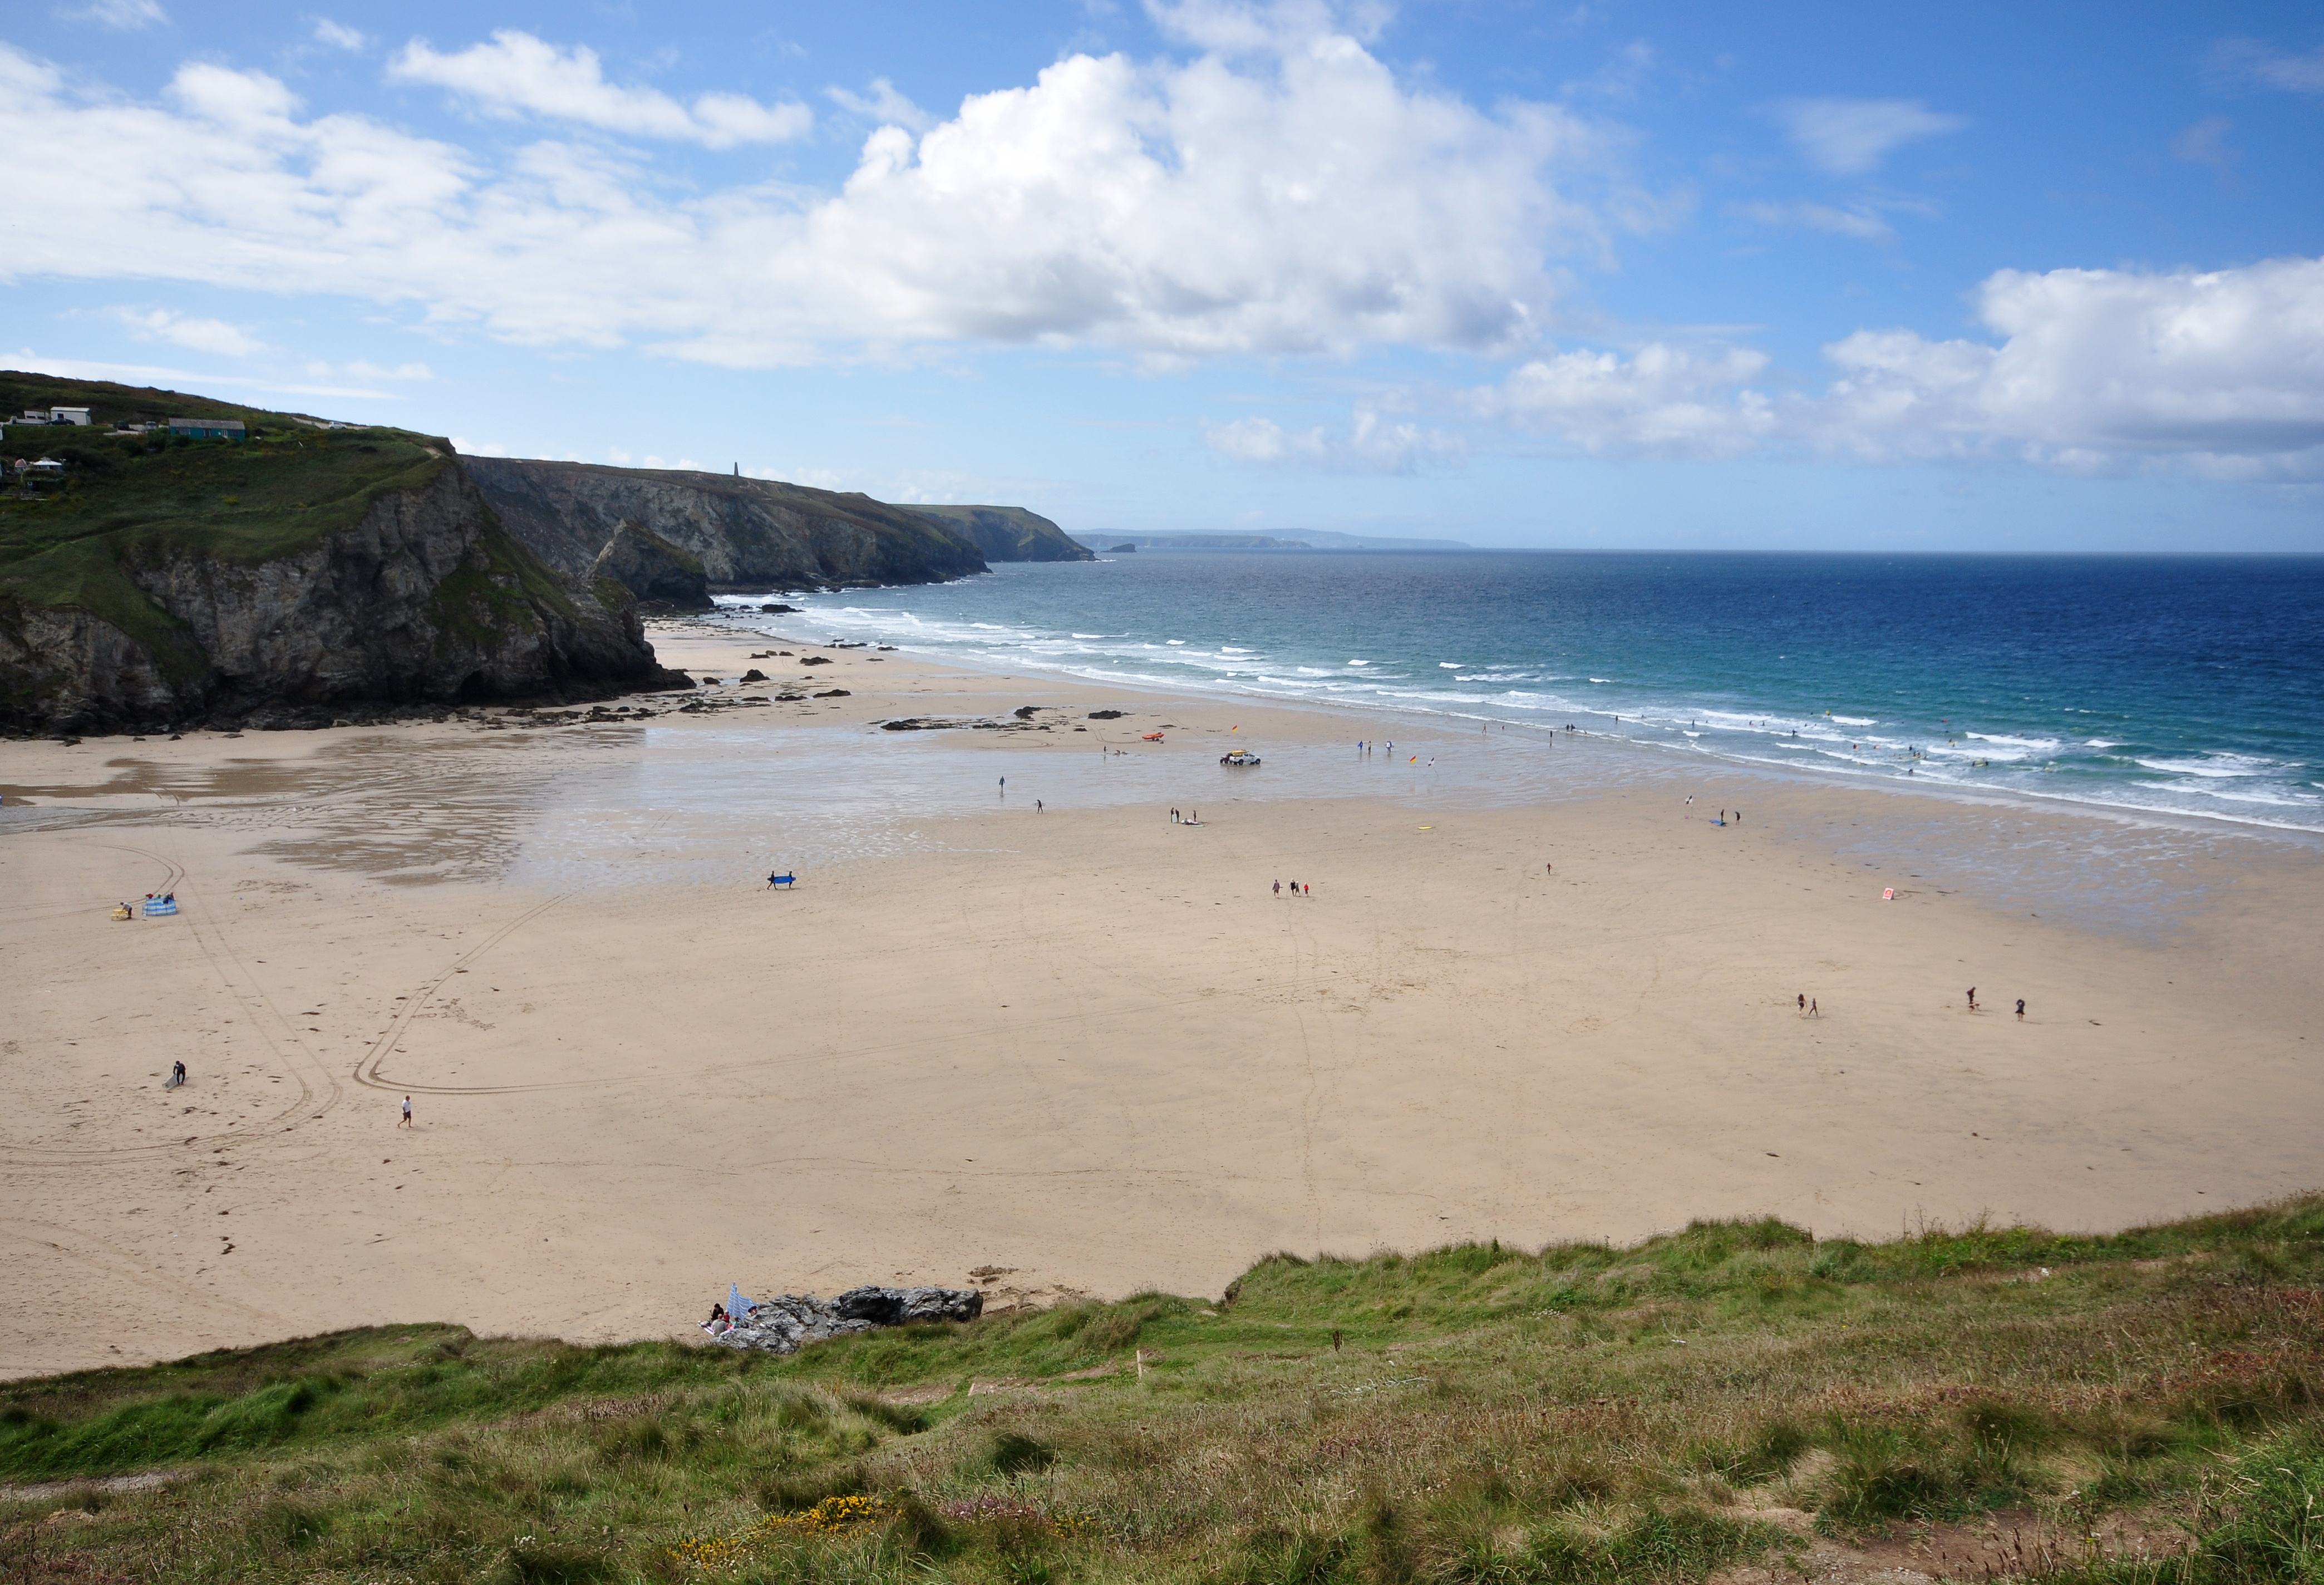 File:Porthtowan beach.jpg Beach